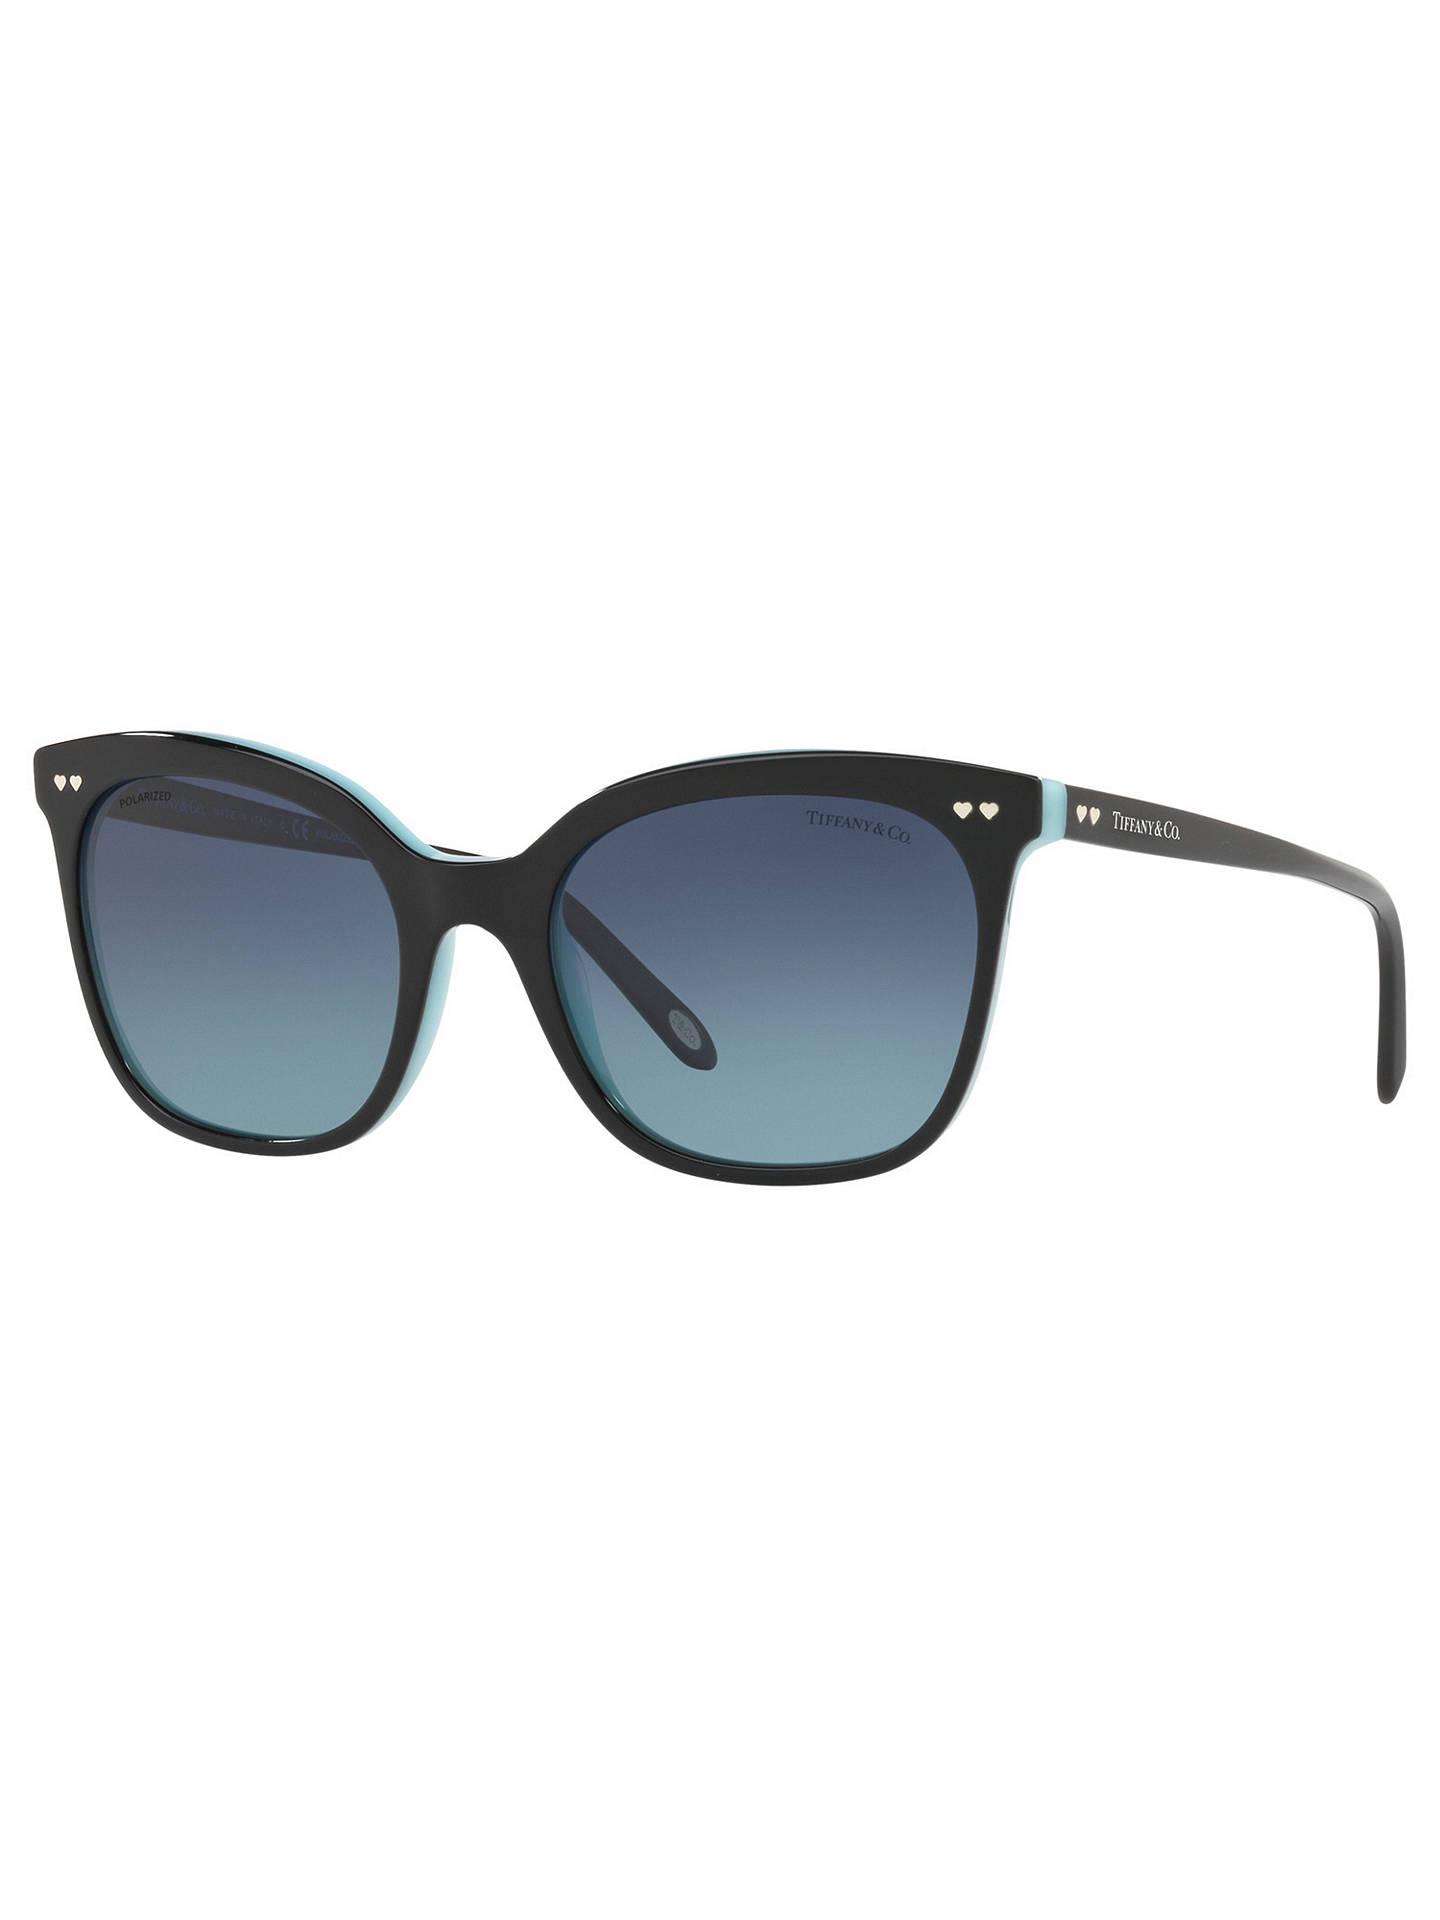 dd7f6ecd4f Buy Tiffany   Co TF4140 Polarised Square Sunglasses